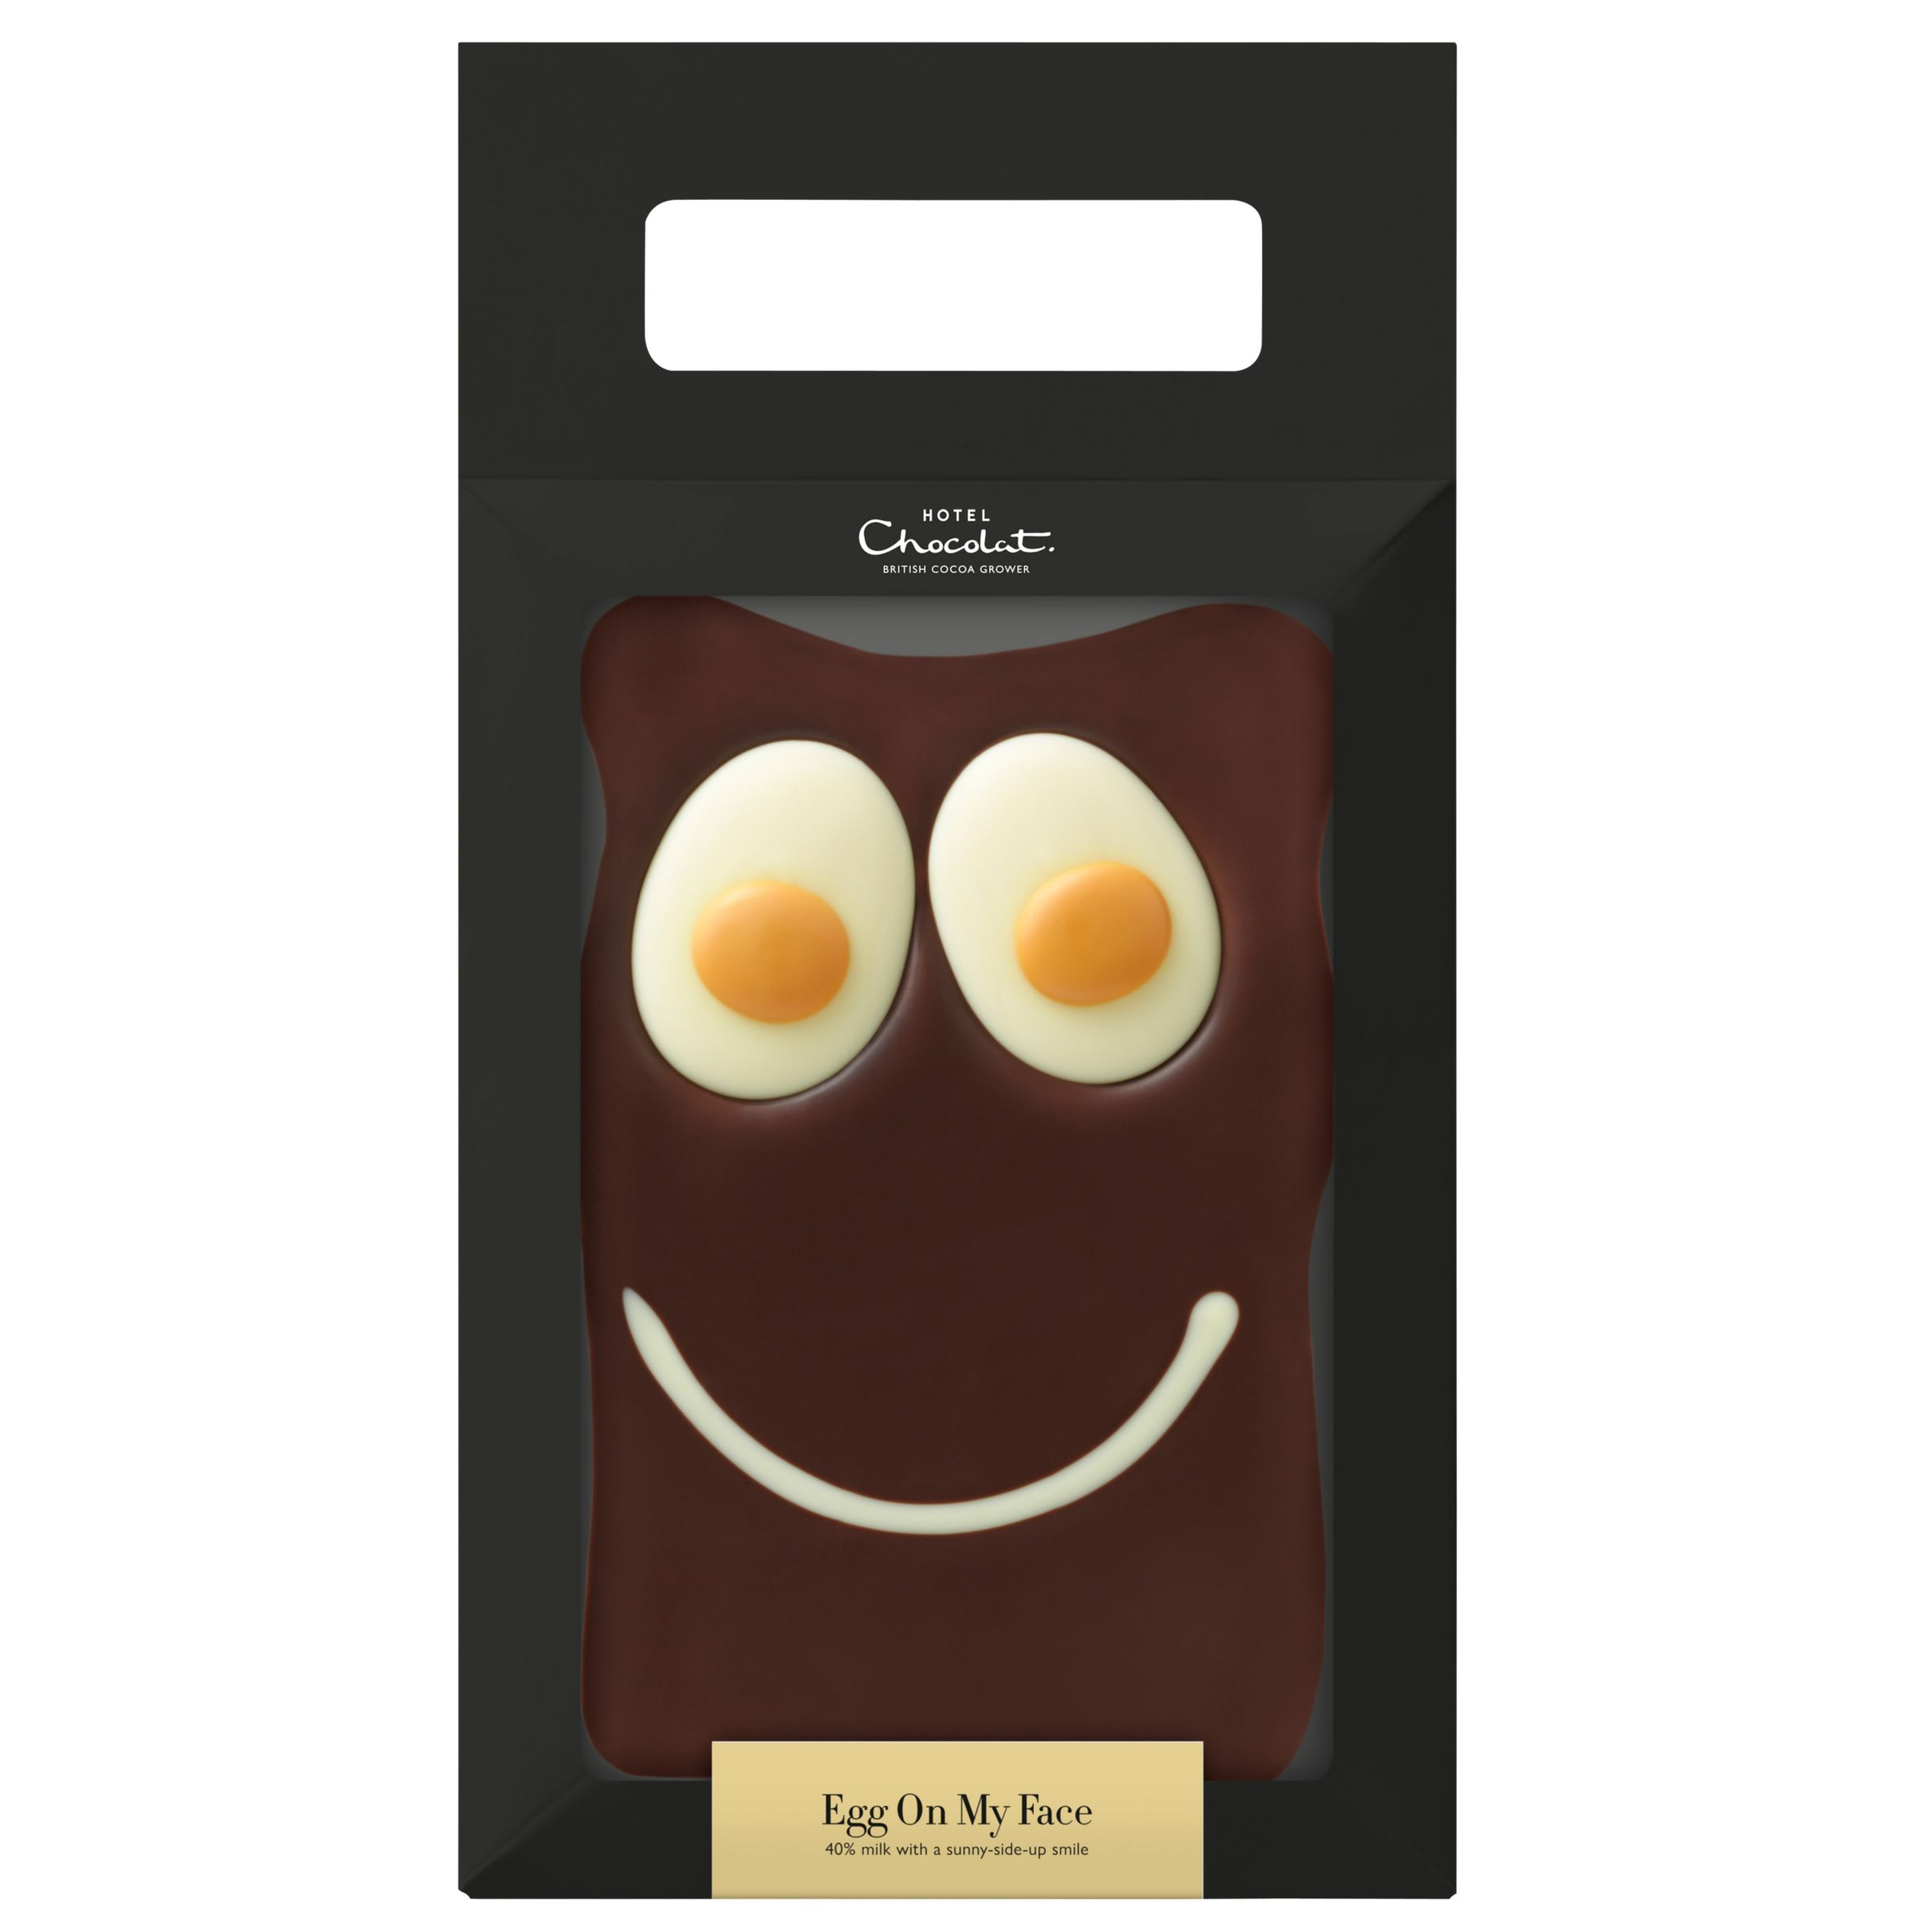 Hotel Chocolat Hotel Chocolat 'Egg On My Face' Milk Chocolate Slab, 200g